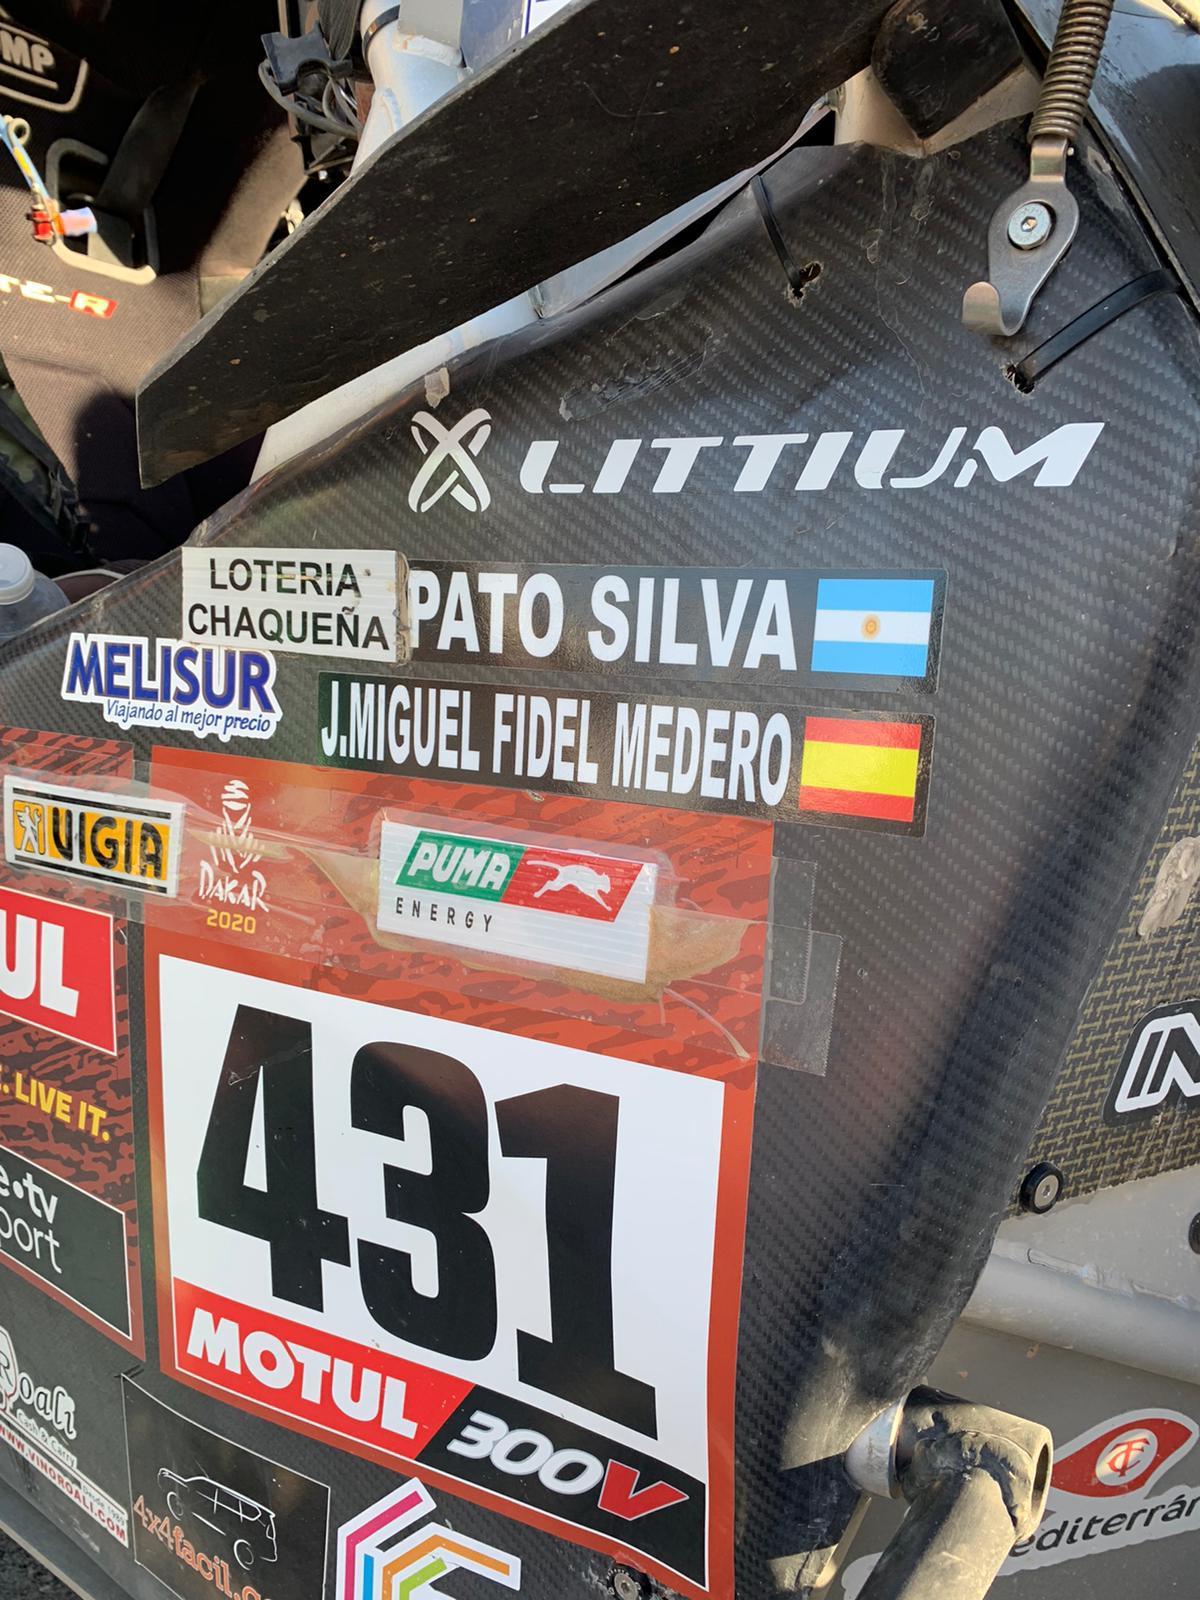 Littium, pleno total en Dakar 2020.